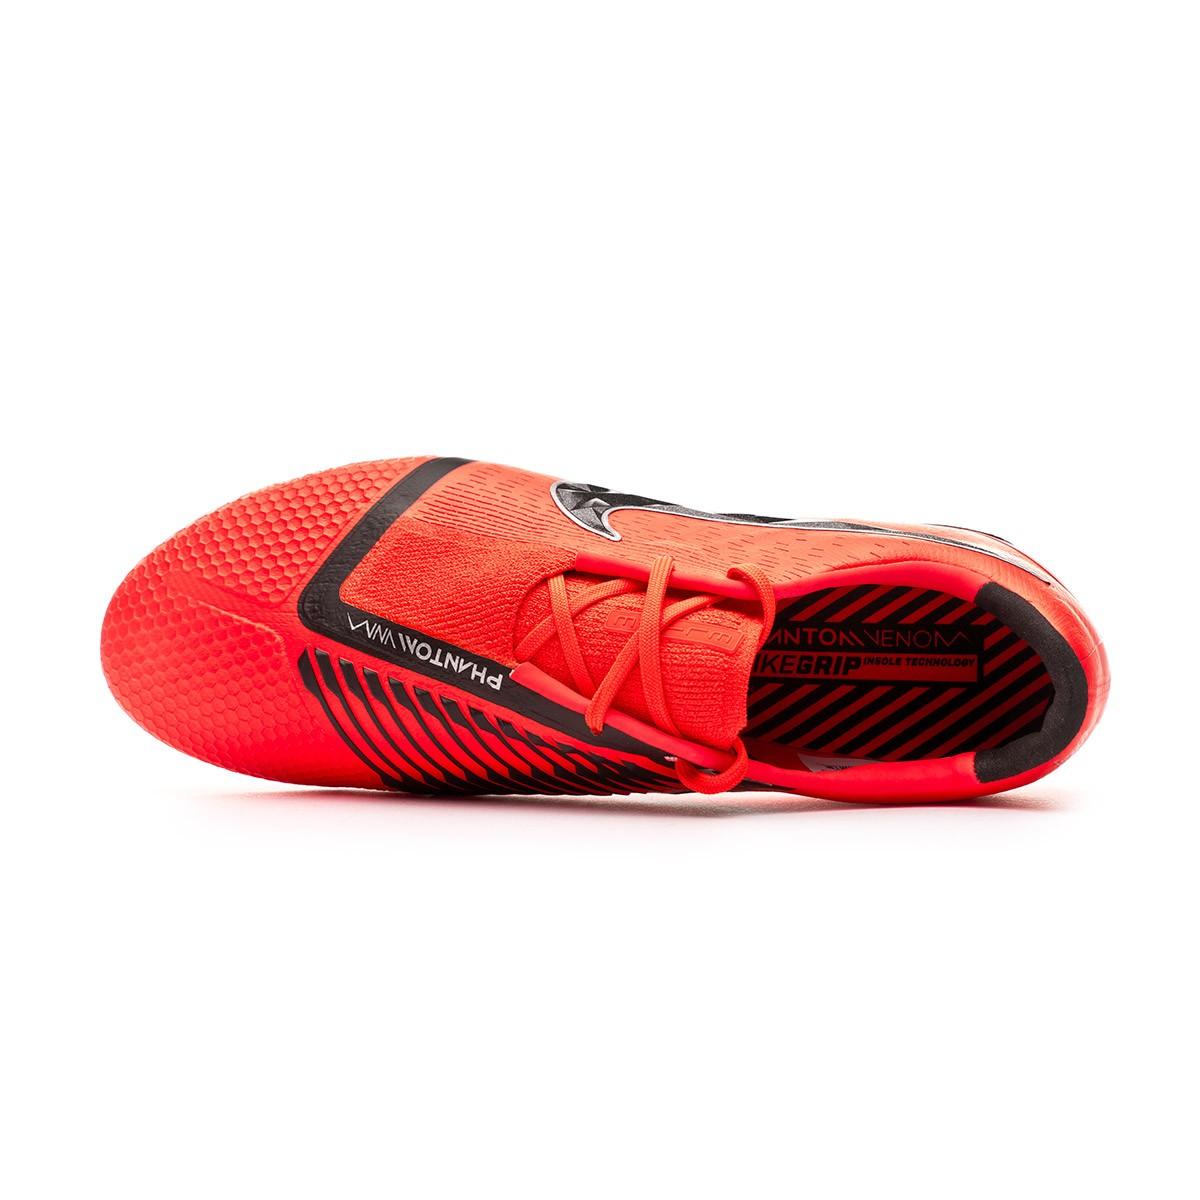 Scarpe Nike Phantom Venom Elite FG Bright crimson Black